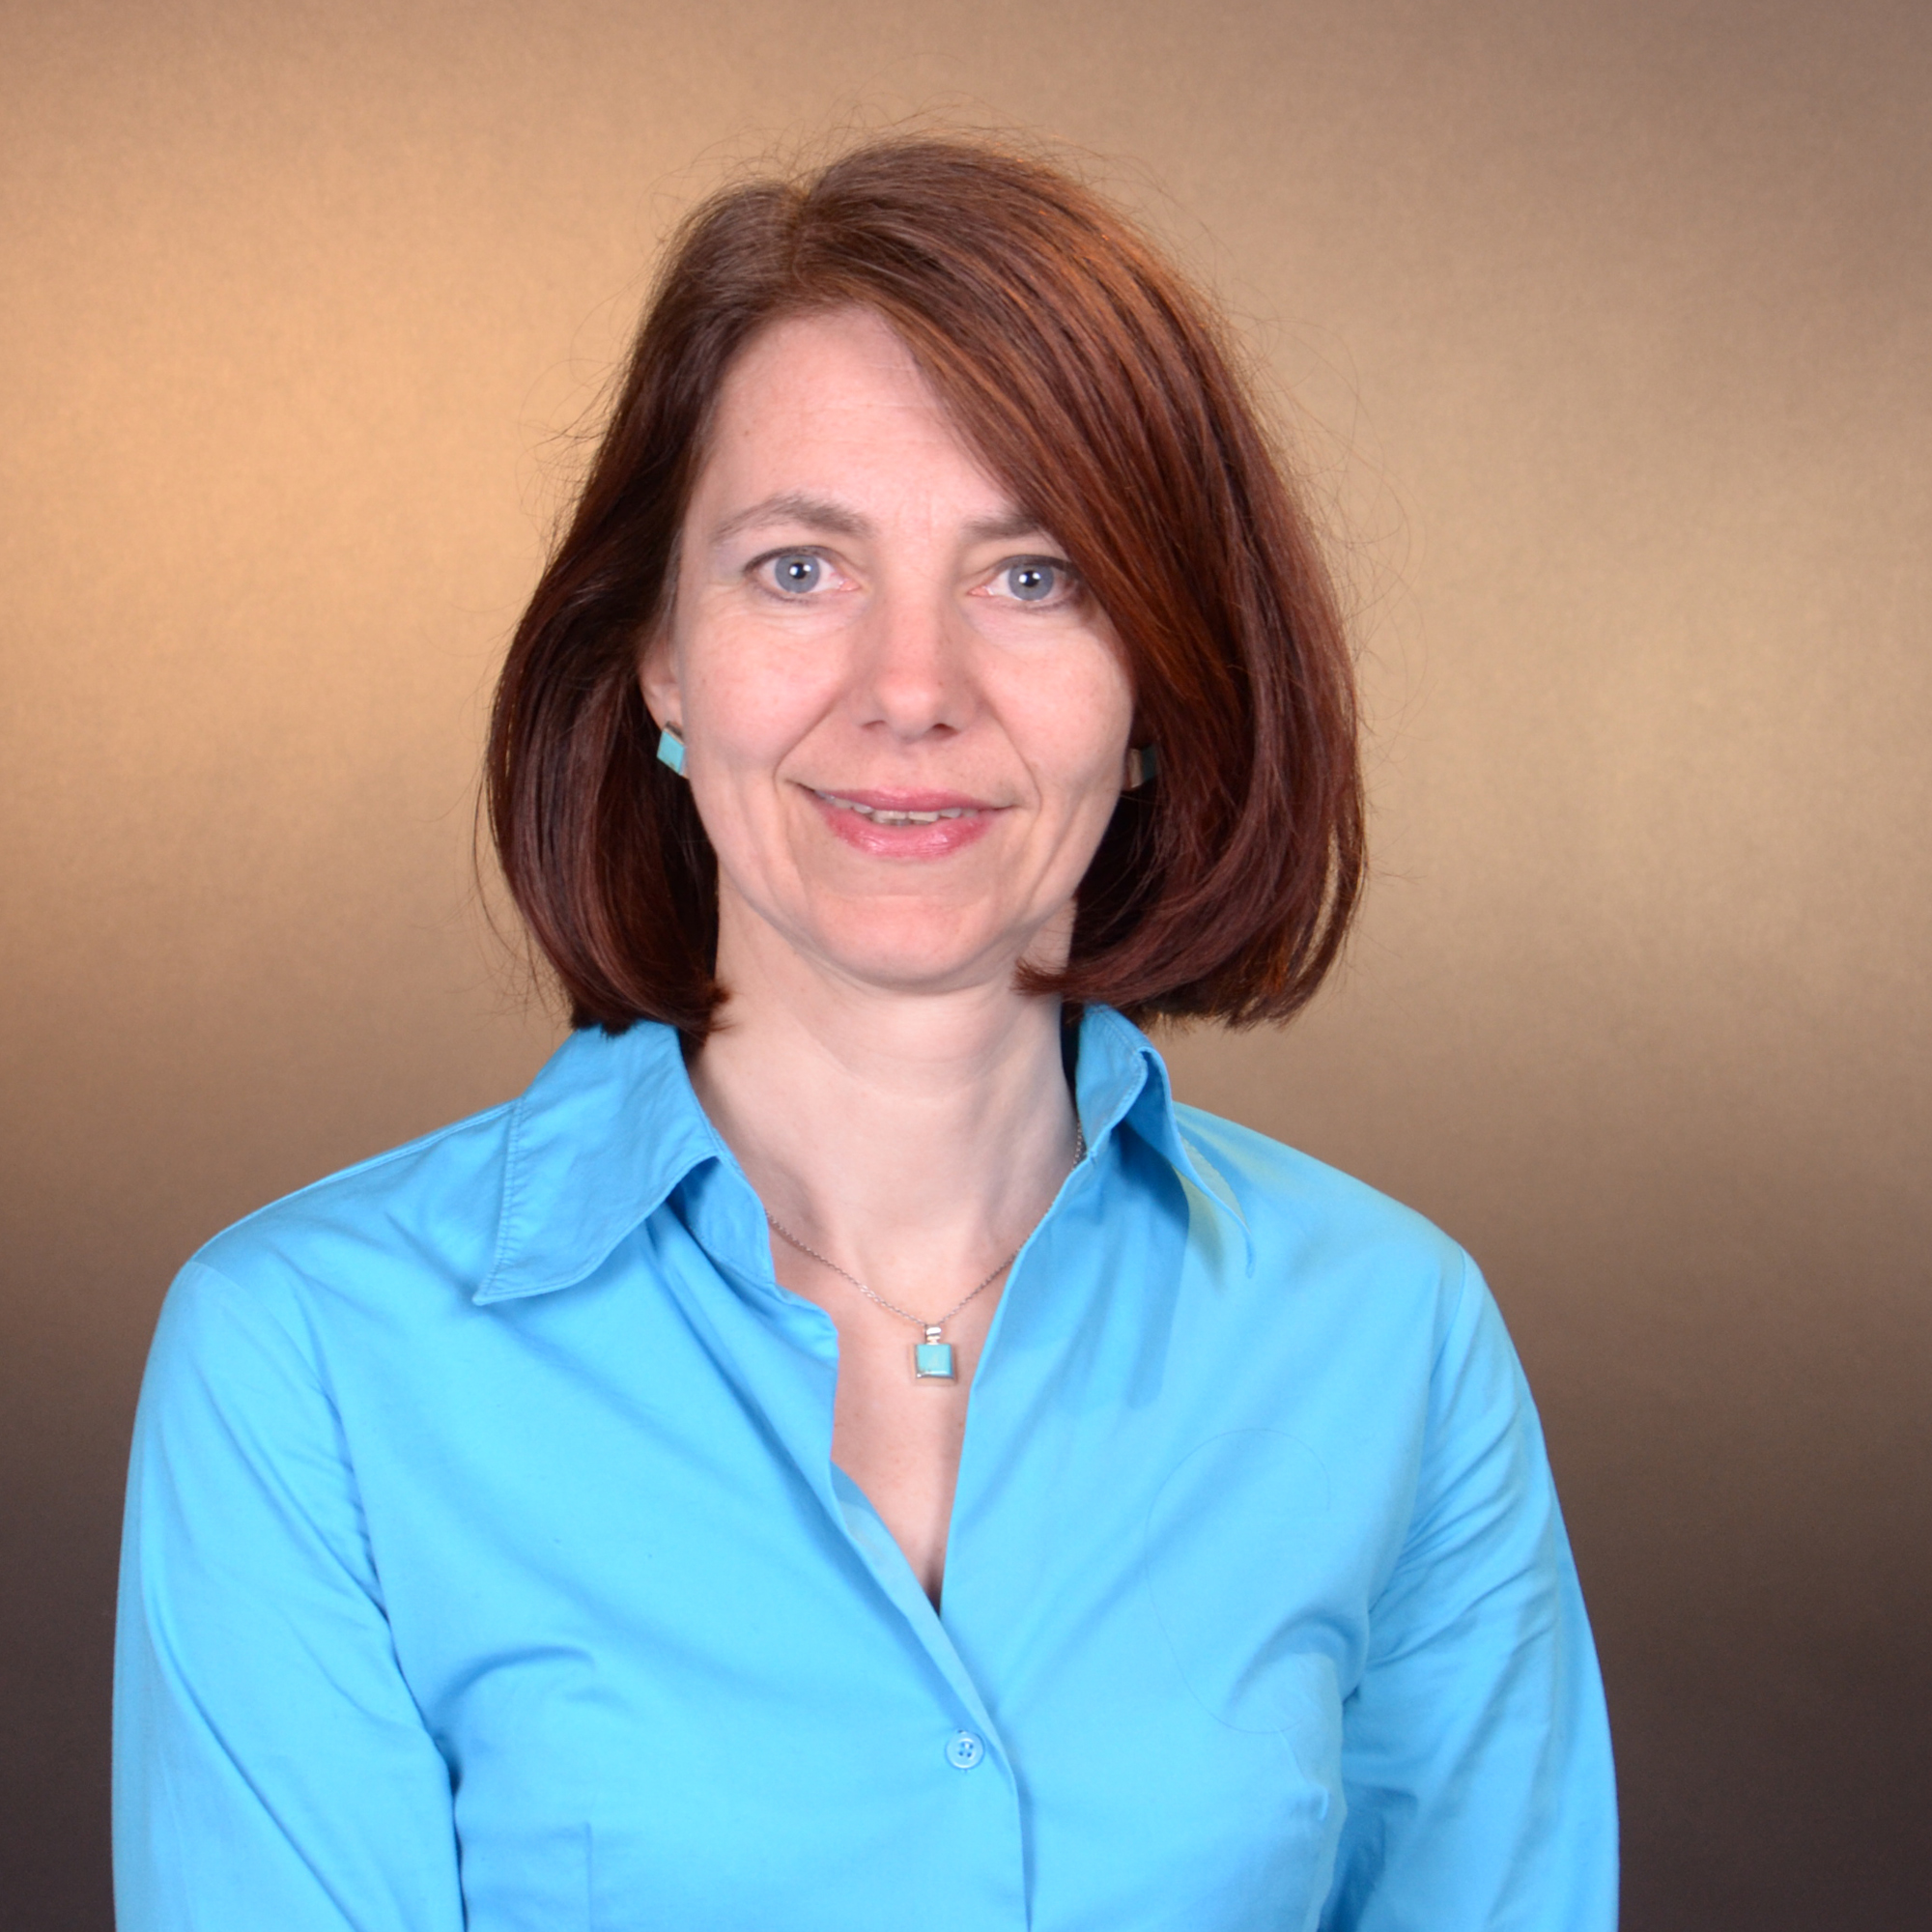 Picture showing Johanna Pfeifer